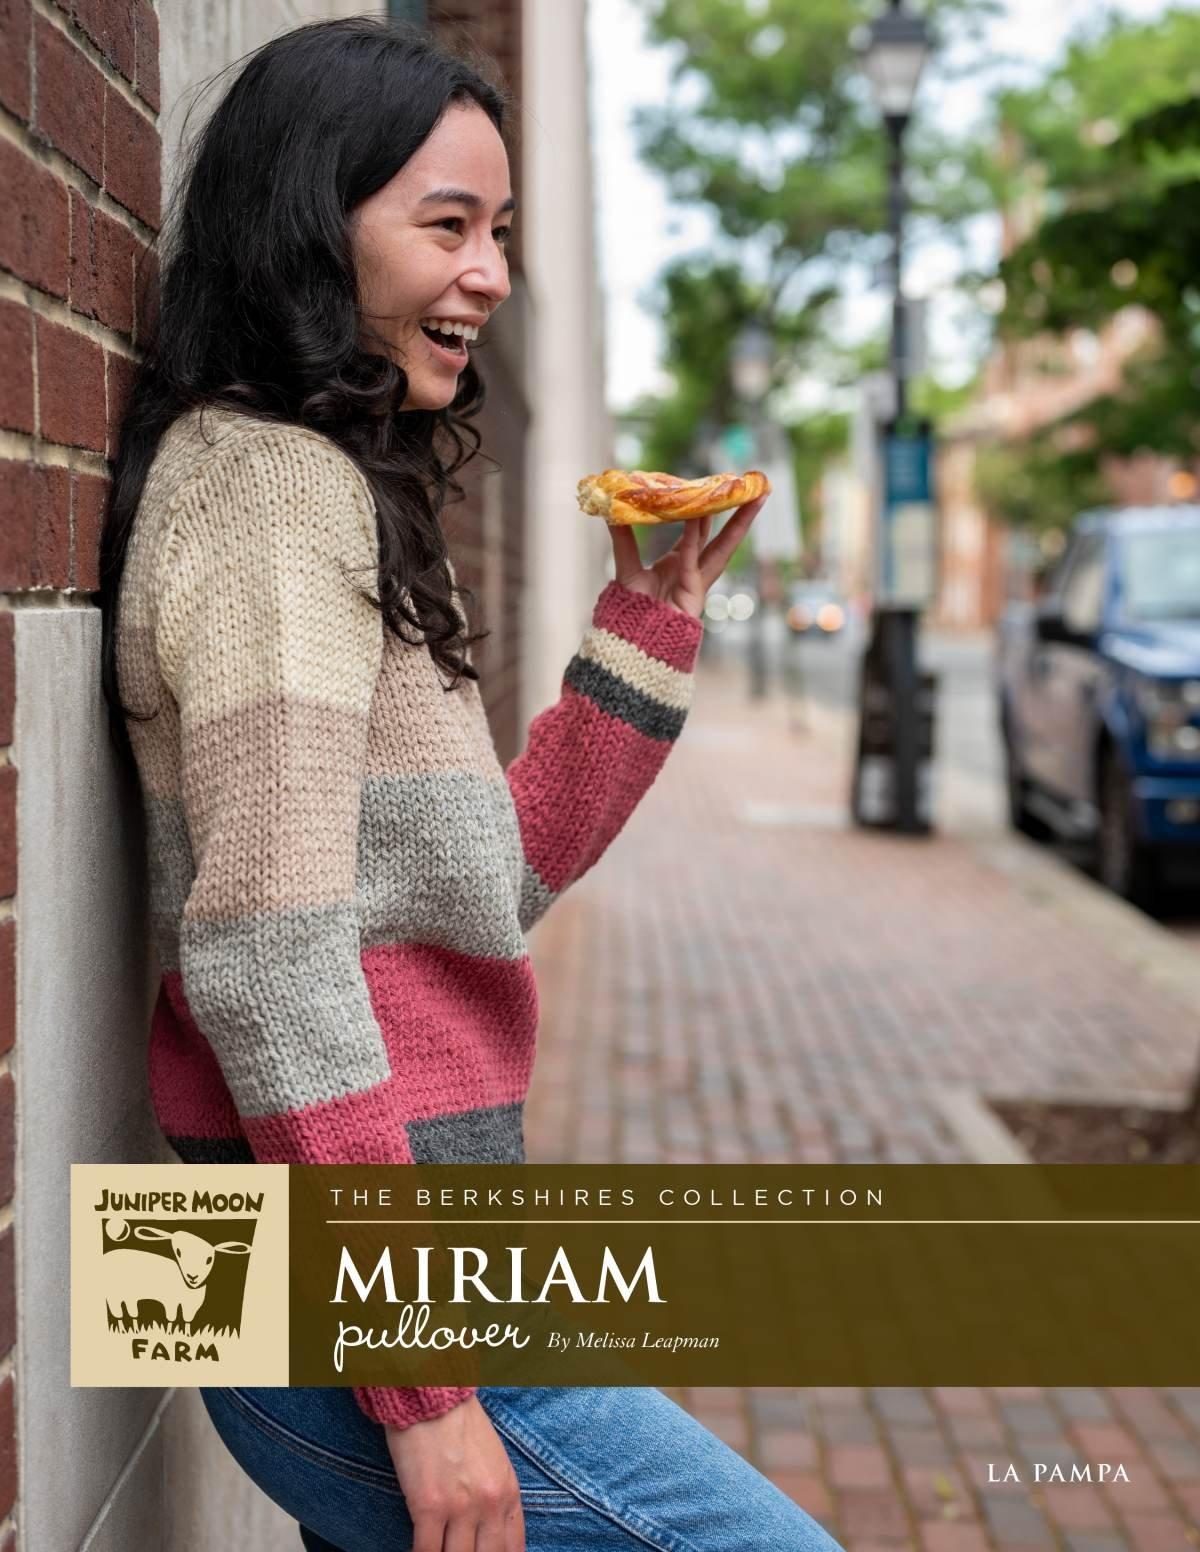 Miriam Pullover pattern